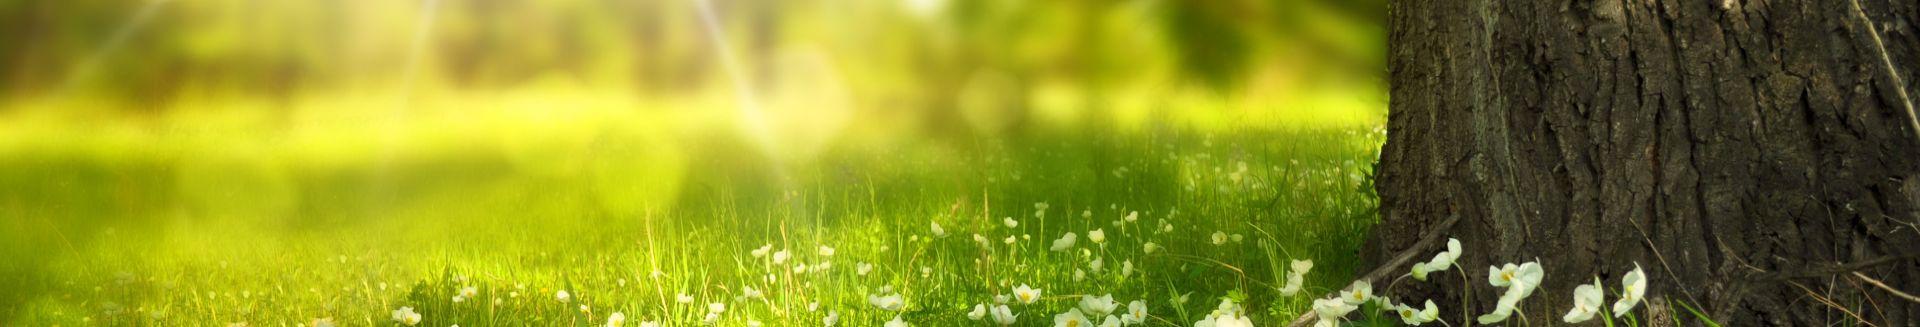 somer-tree-flowers-meadow-a